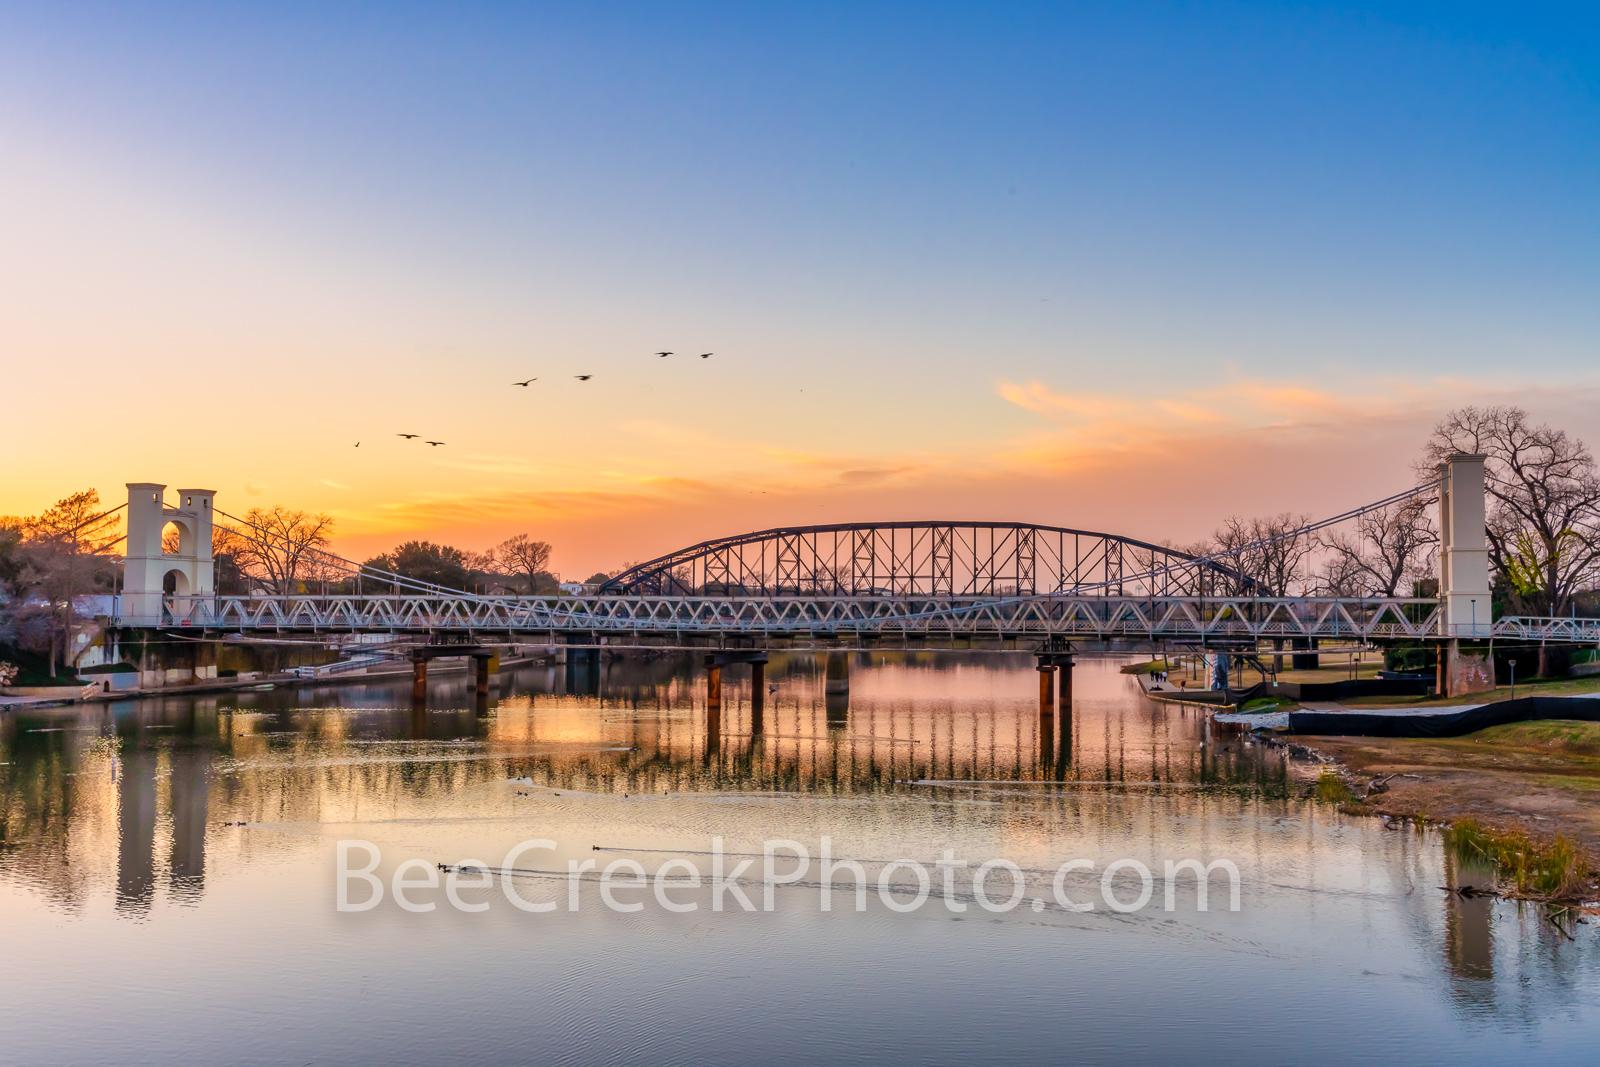 waco, downtown waco, waco texas, texas, city of waco, suspension bridge, historic bridge, historic suspension bridge, chisom trail, longhorns, sunset, sunrise, landmark, iconic, clouds, colorful, braz, photo